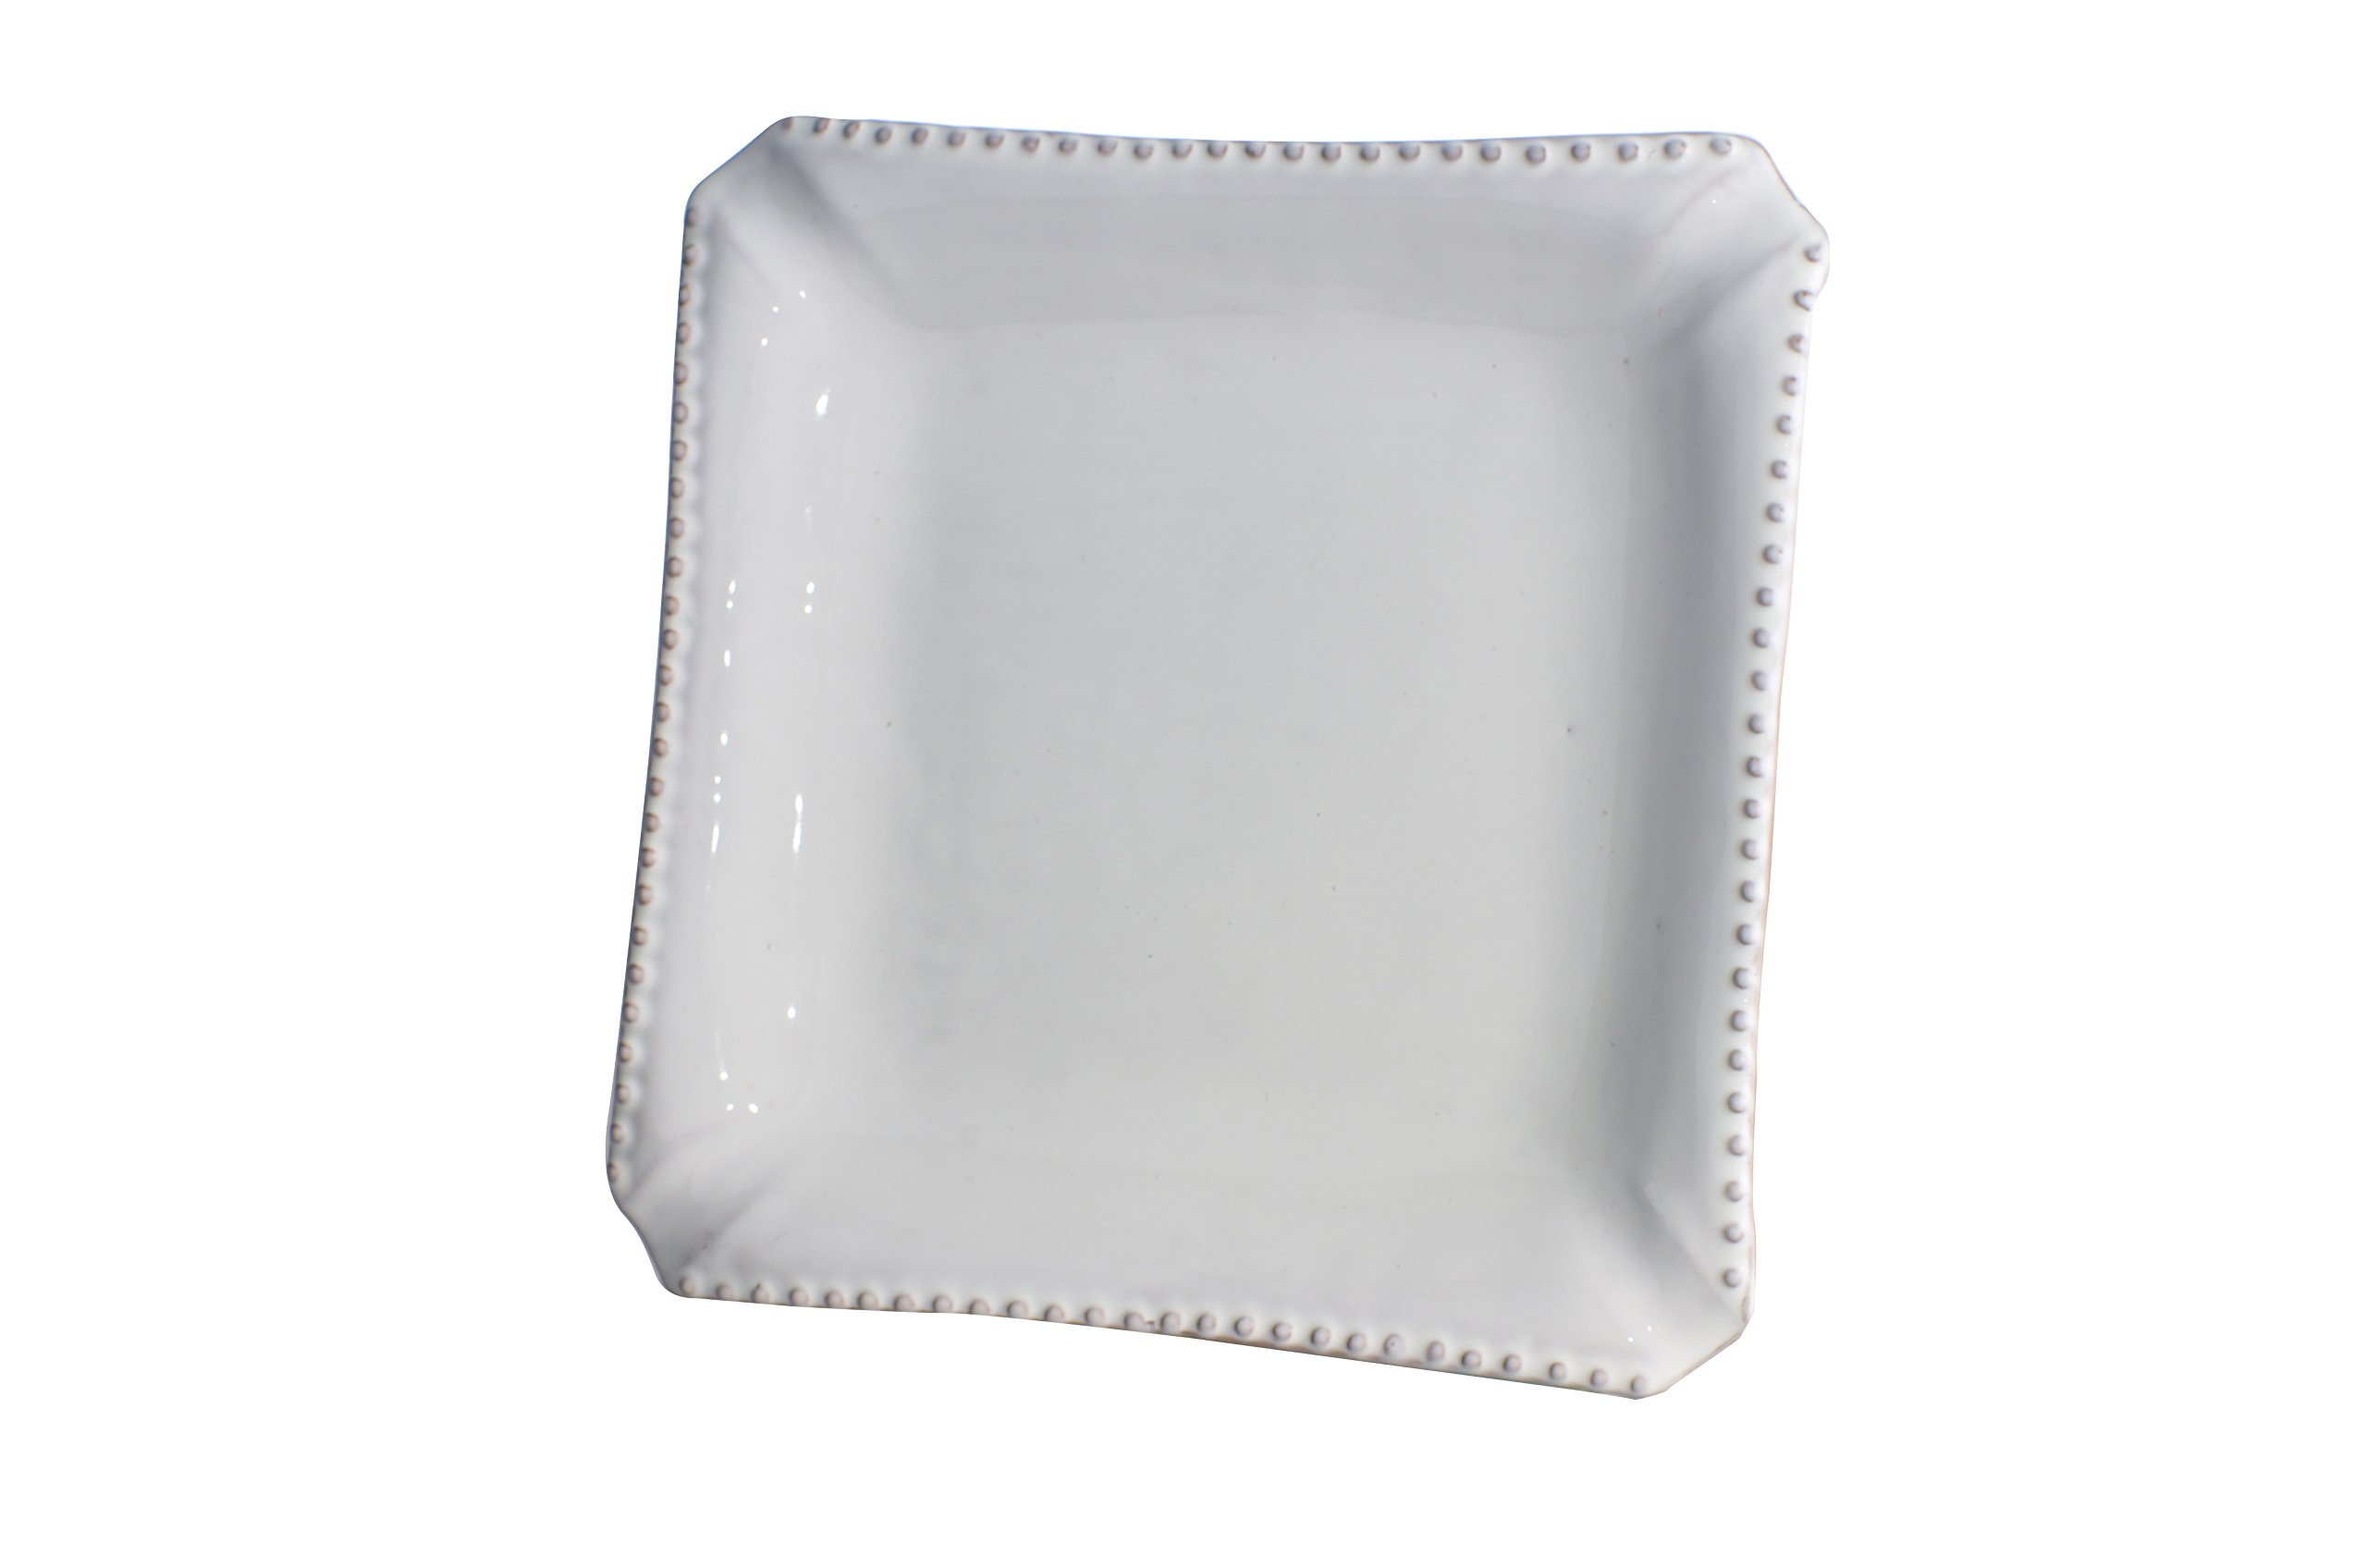 Abigails Square Charlot Ceramic Dinner Plate with Beaded Rim (Set of 4), White, 11'' x 1.5'' x 11''